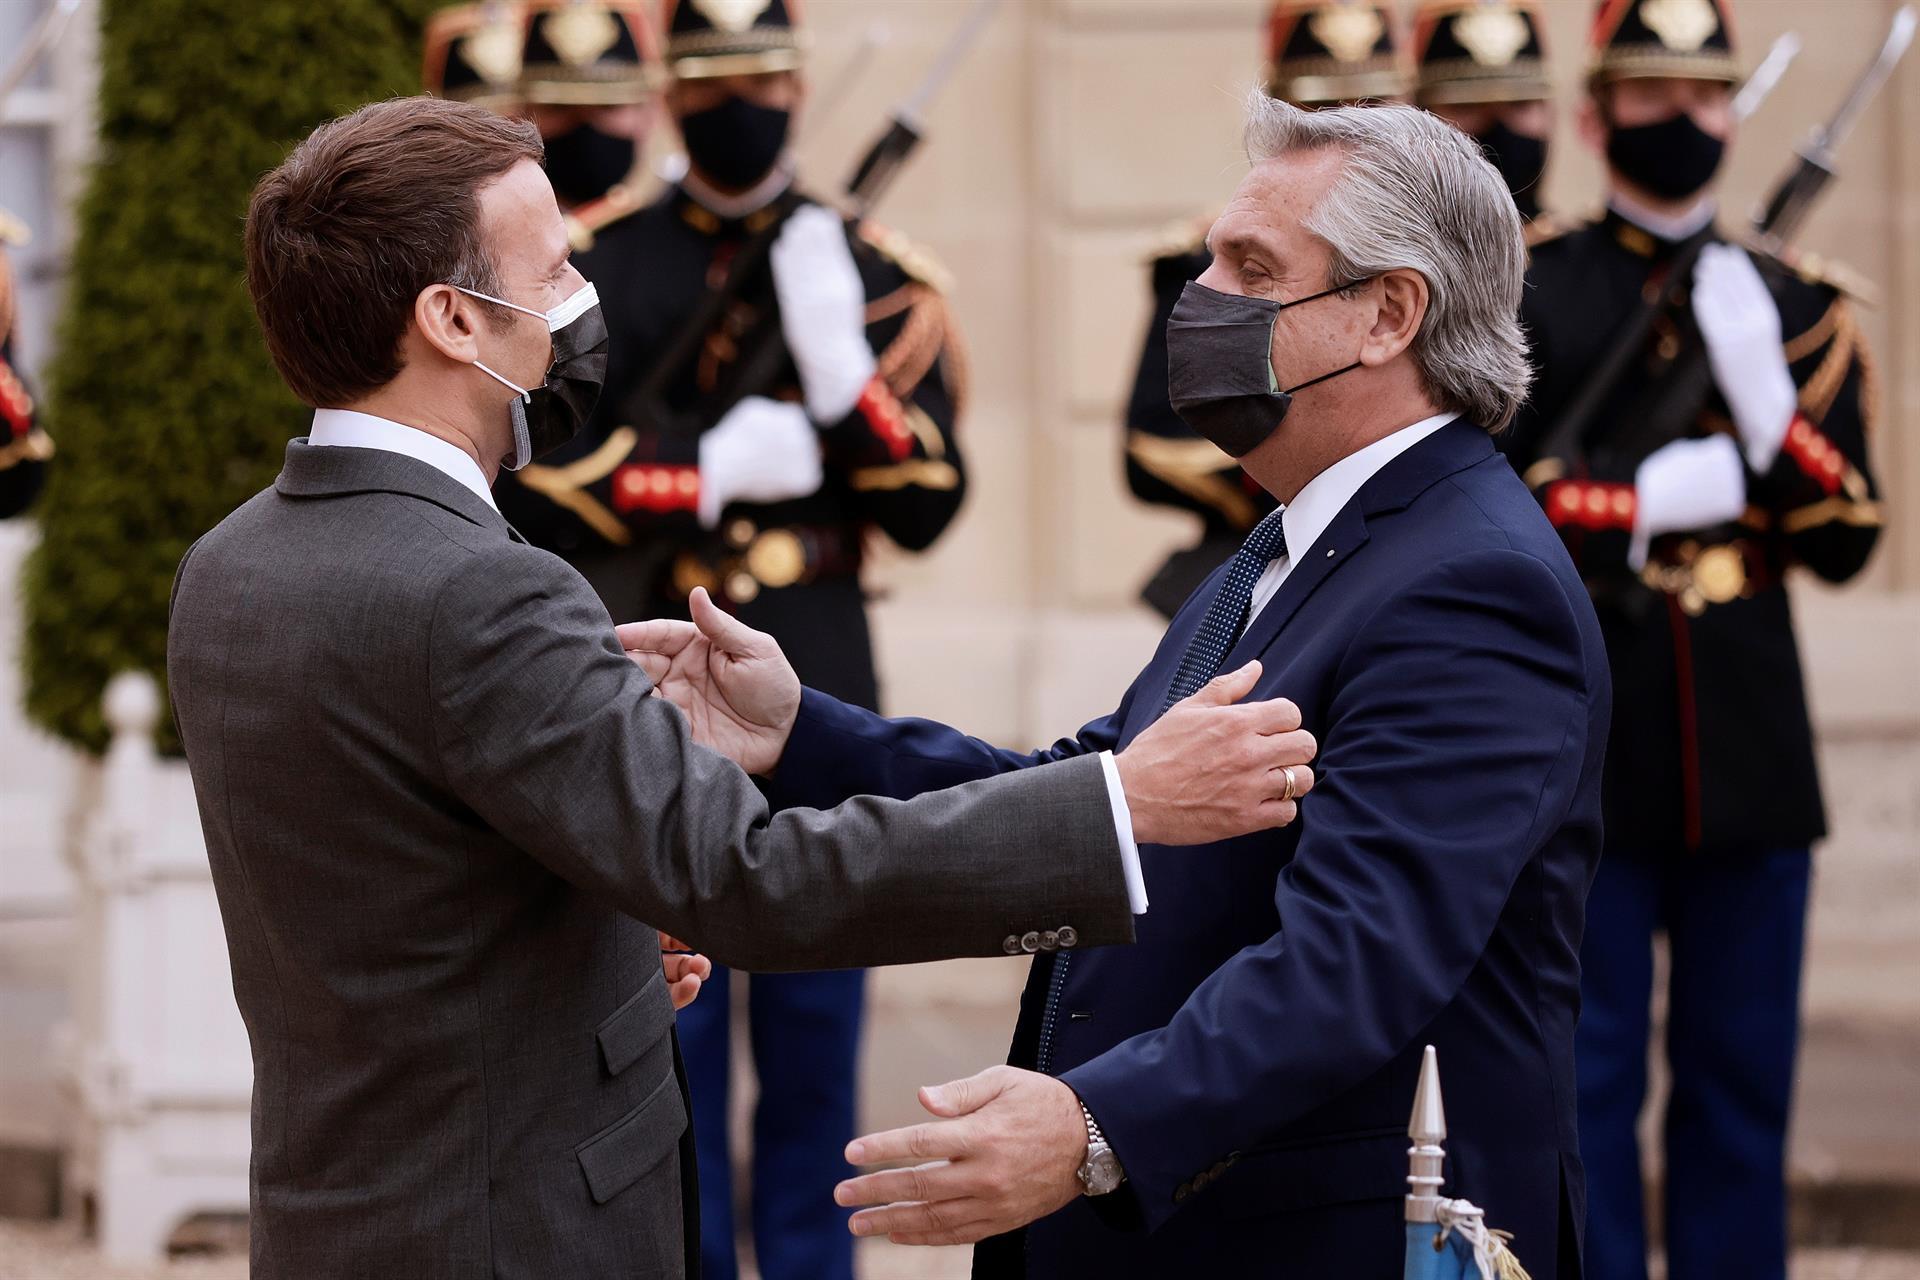 Presidente da França, Emmanuel Macron, cumprimenta presidente da Argentina, Alberto Fernández